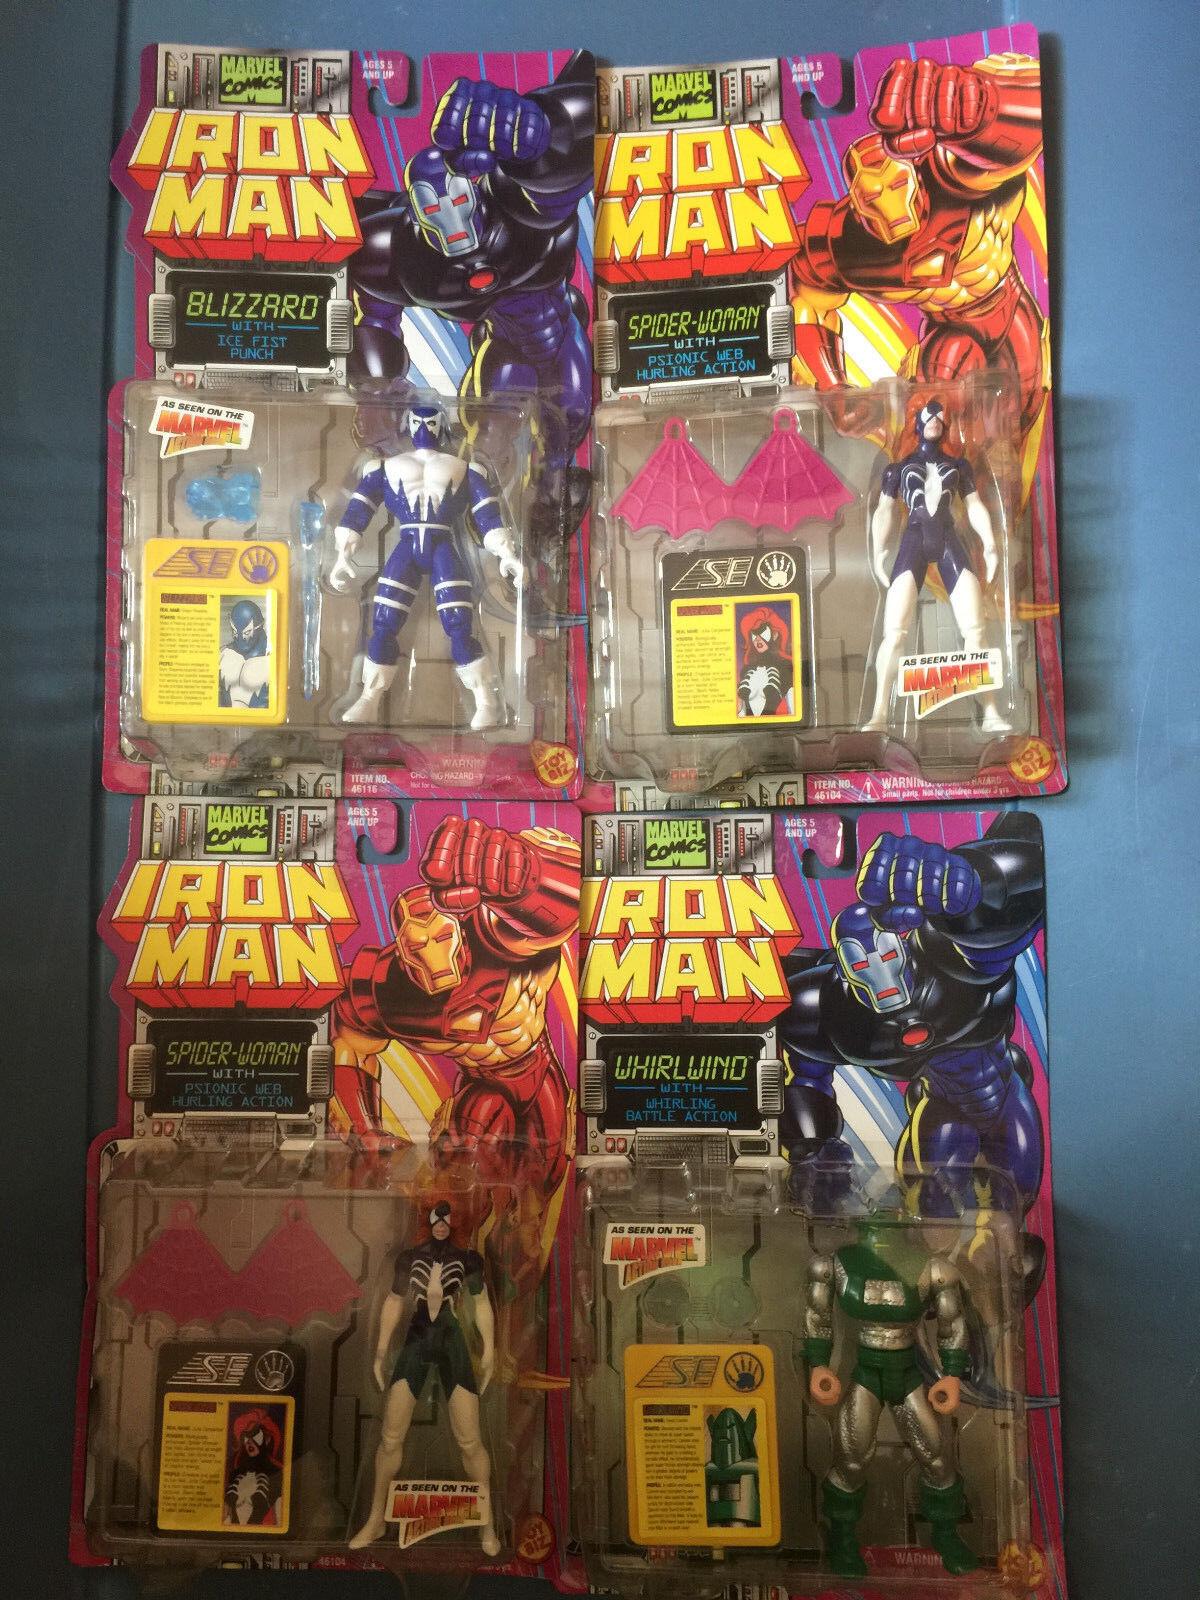 Iron Iron Iron Man action figure bundle Spiderwoman (2), Whirlwind, Blizzard 1037d8